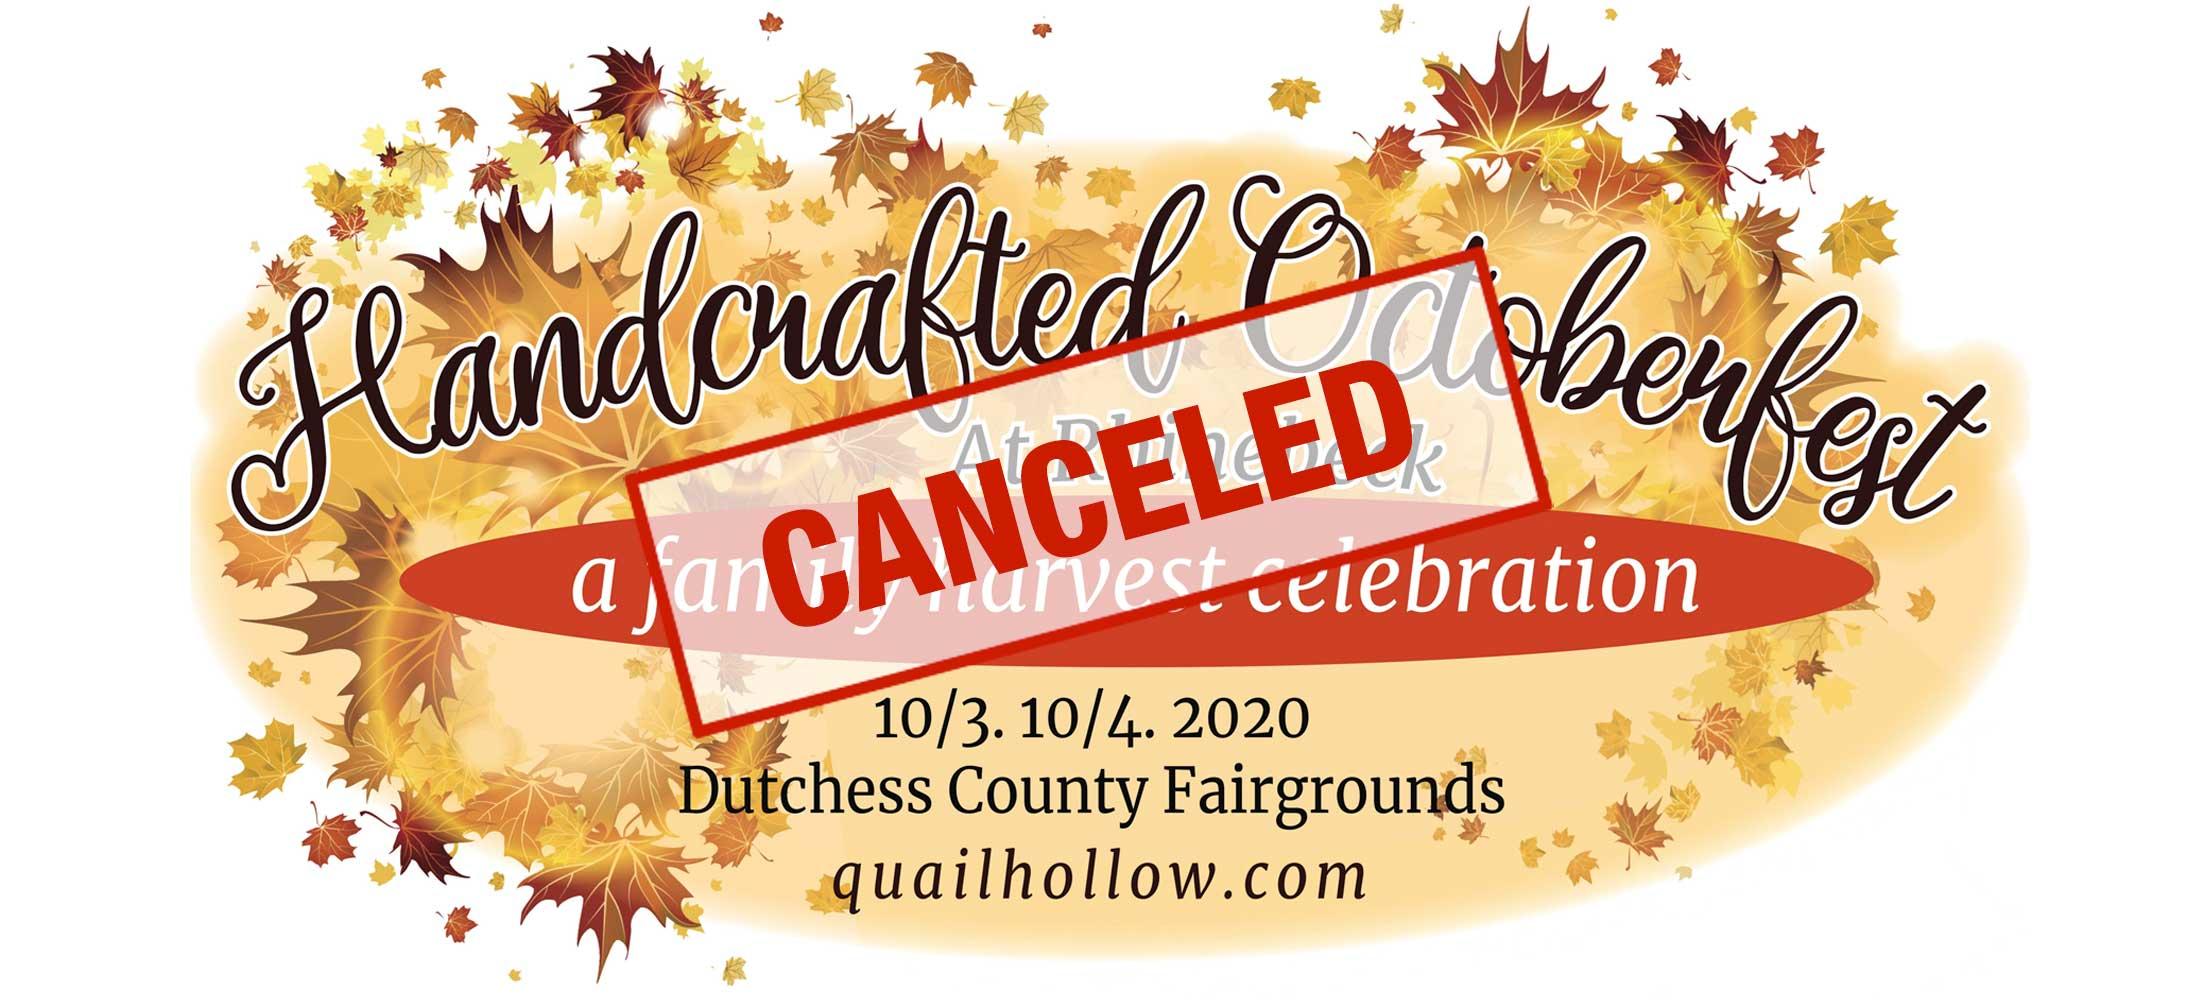 Handcrafted Octoberfest Rhinebeck CANCELED